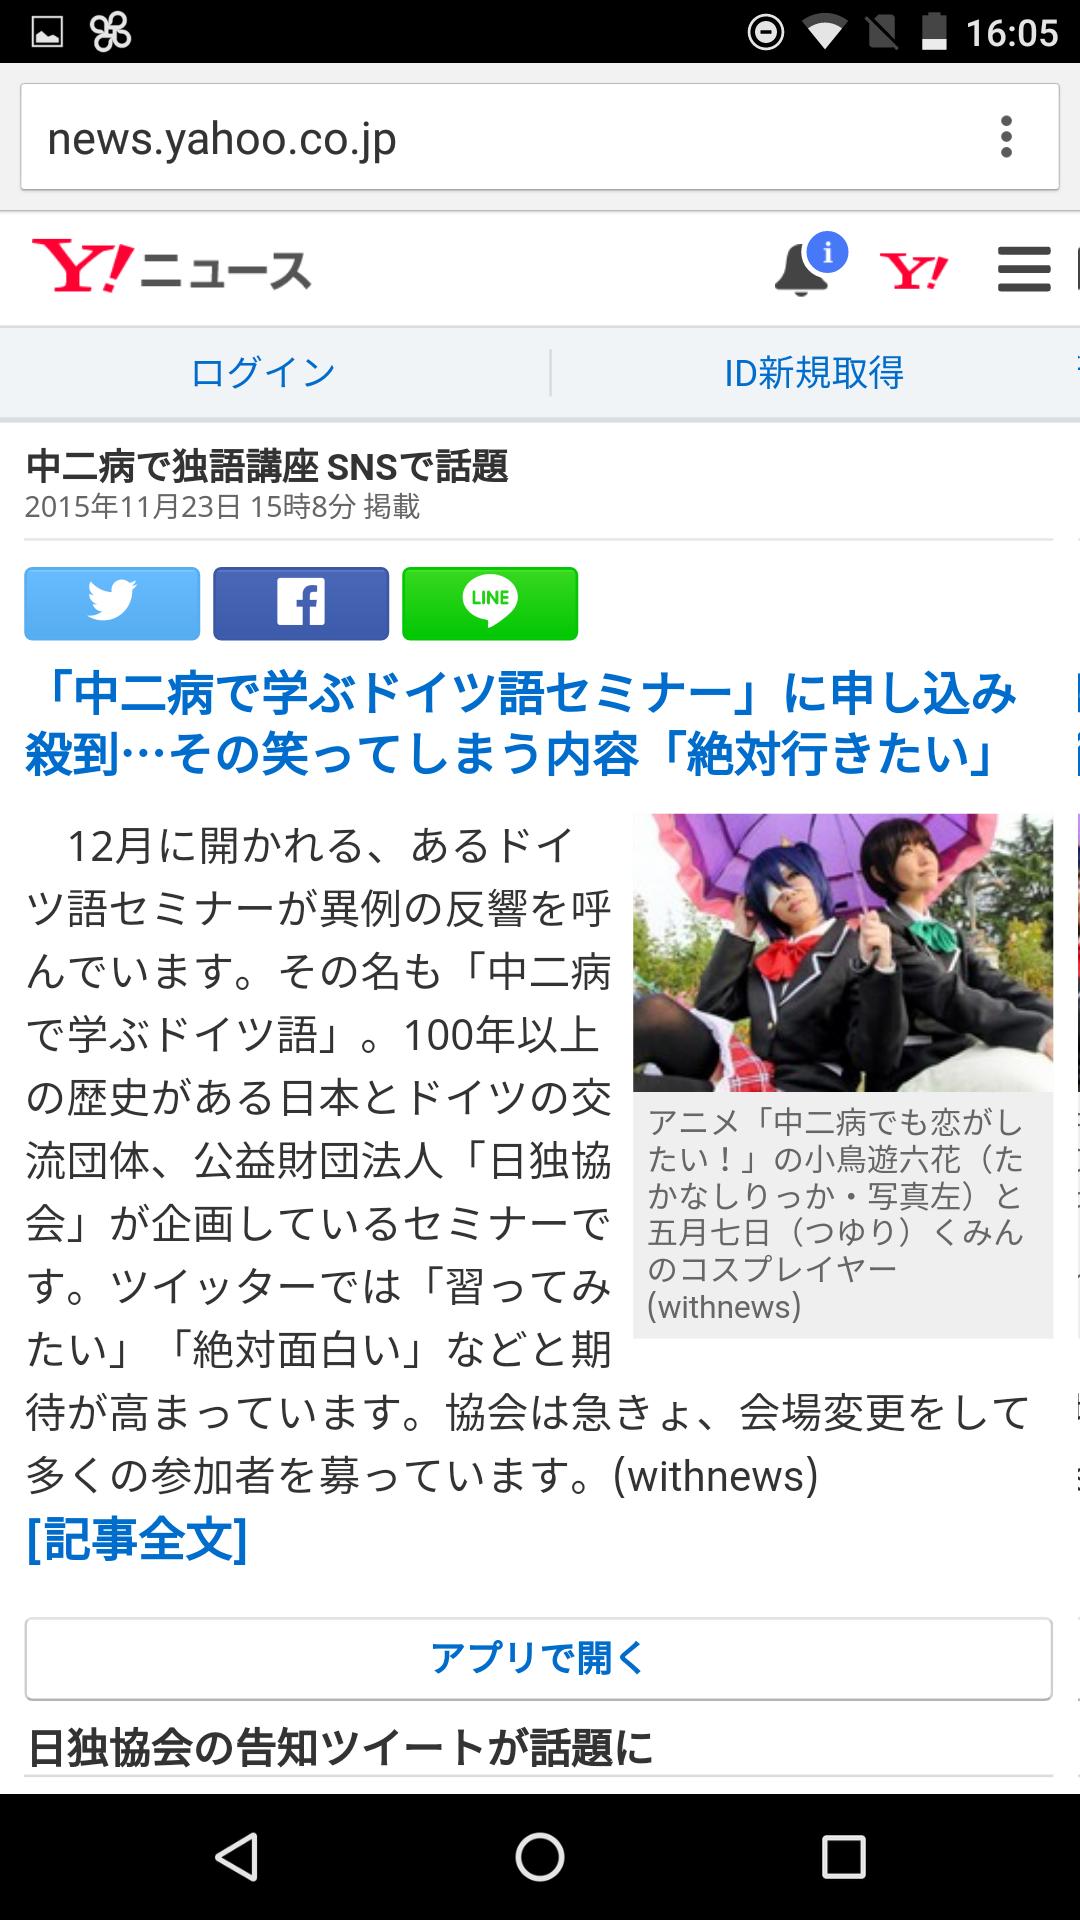 http://www.spicysoft.com/blog/spicy_watch/media/Screenshot_20151125-160552.png